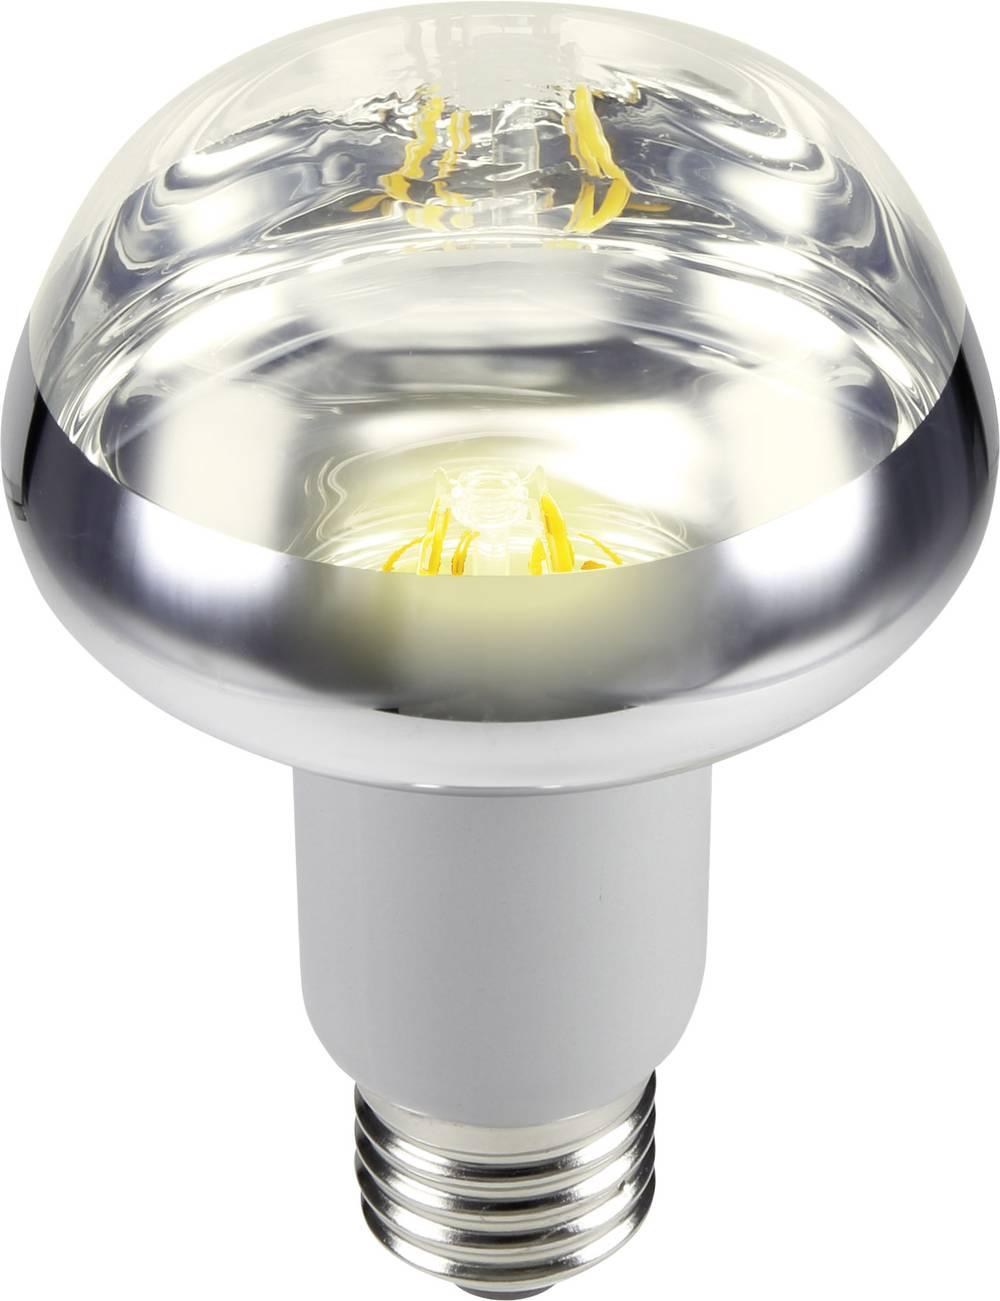 LED žarnica E27 reflektorska 5.5 W = 42 W topla bela (premer x D) 80 mm x 117 mm EEK: A Sygonix filament 1 kos